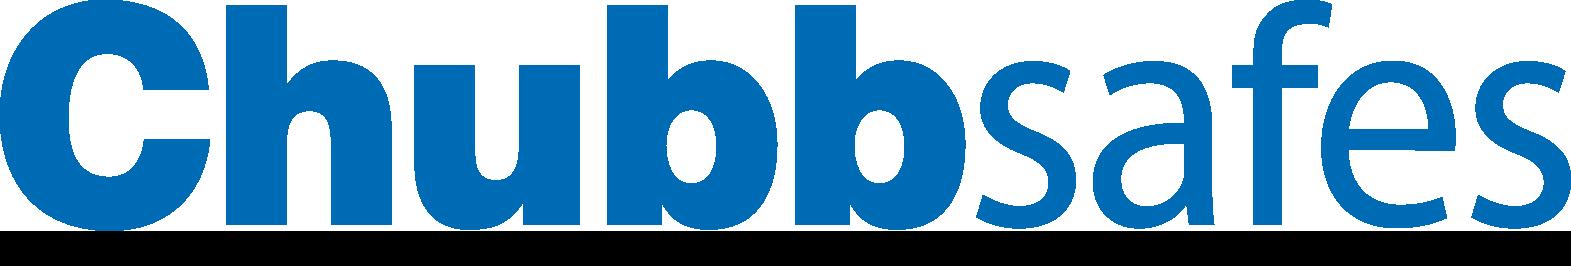 logo chubbsafes